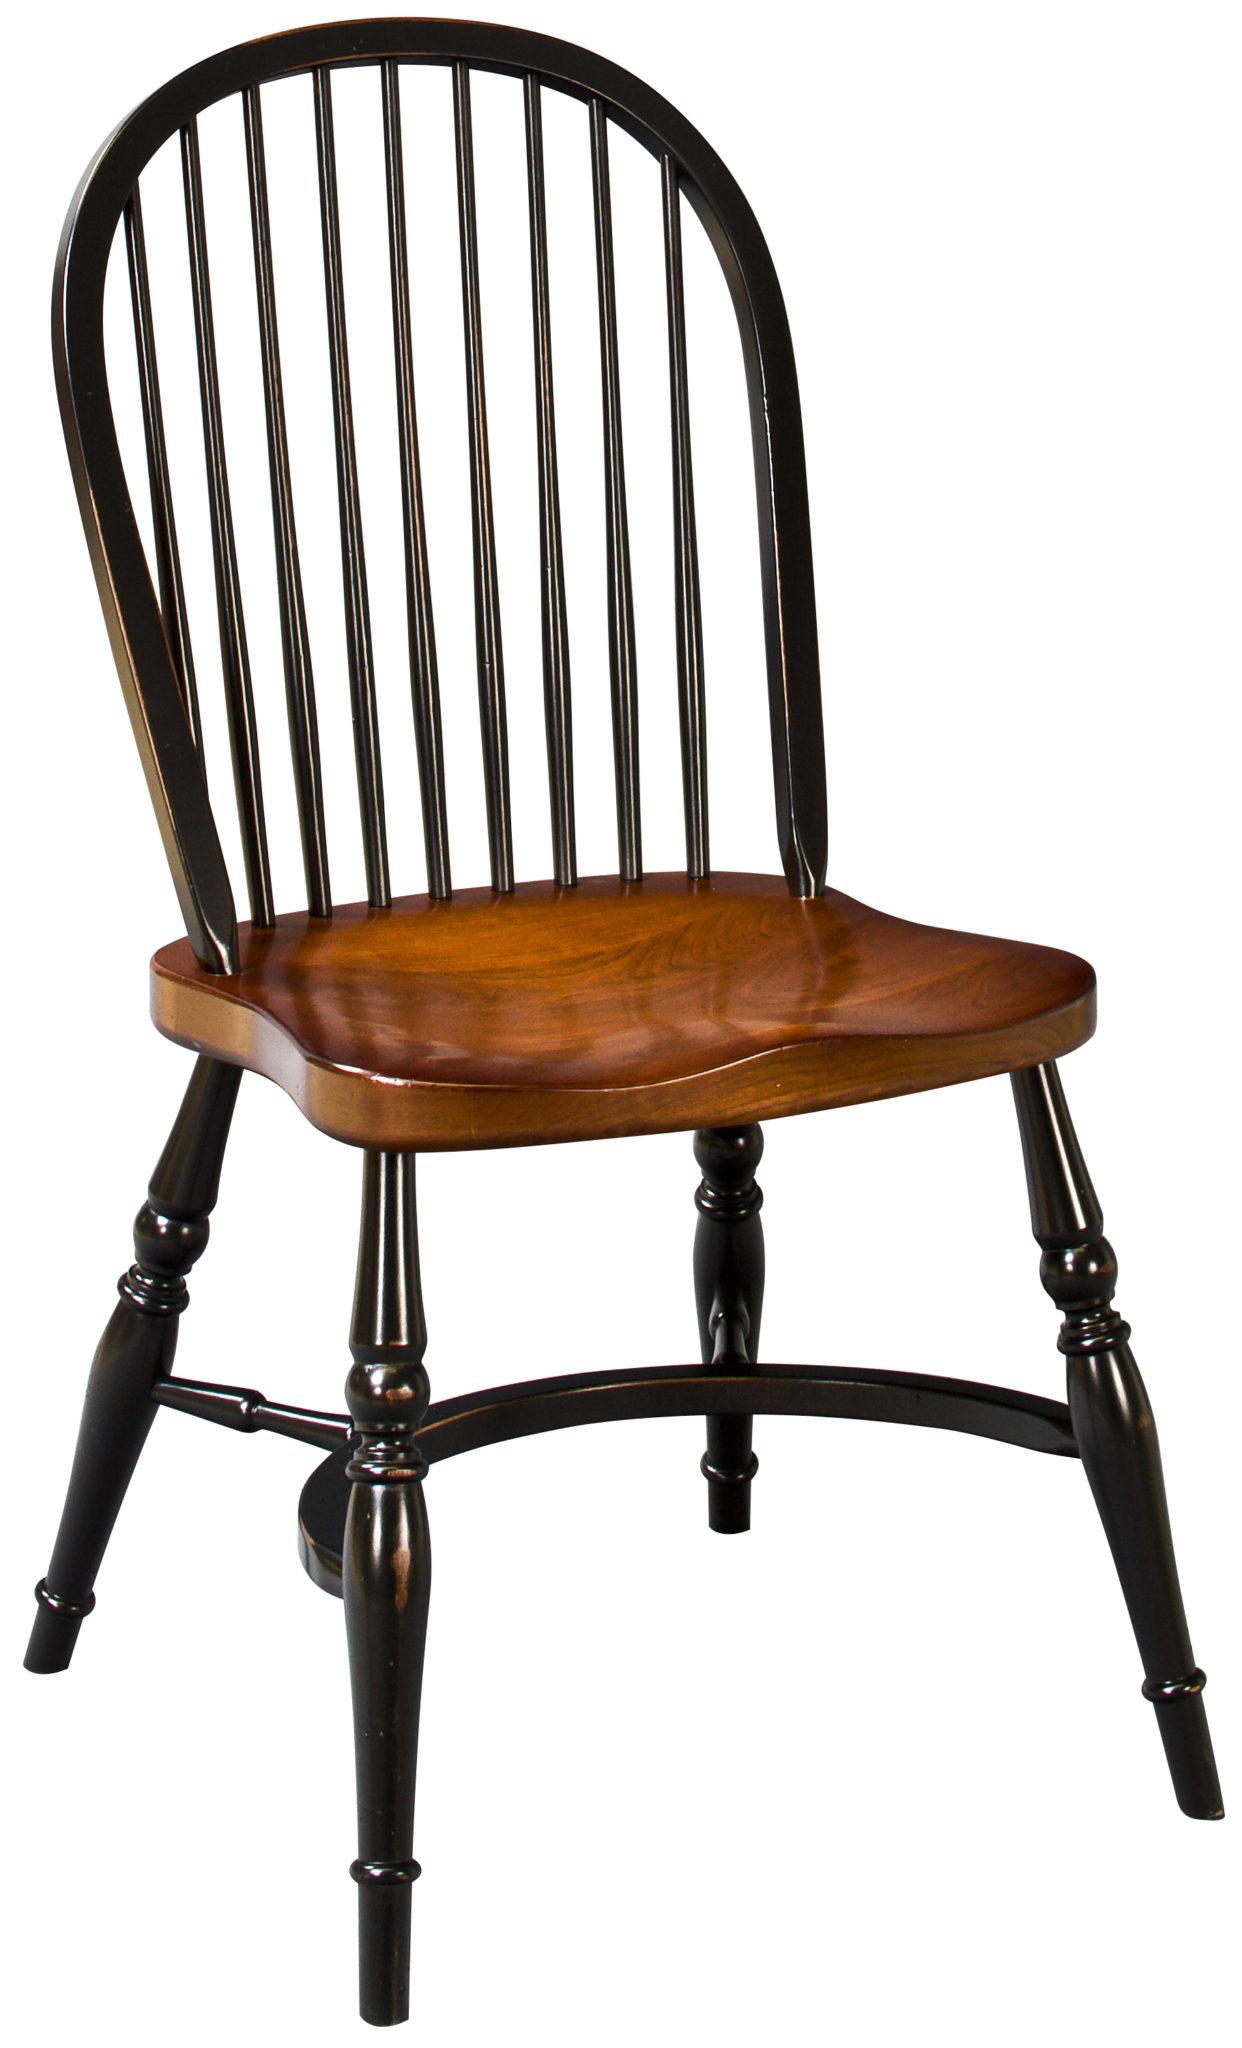 320-English-Windsor-Side-Chair.jpg